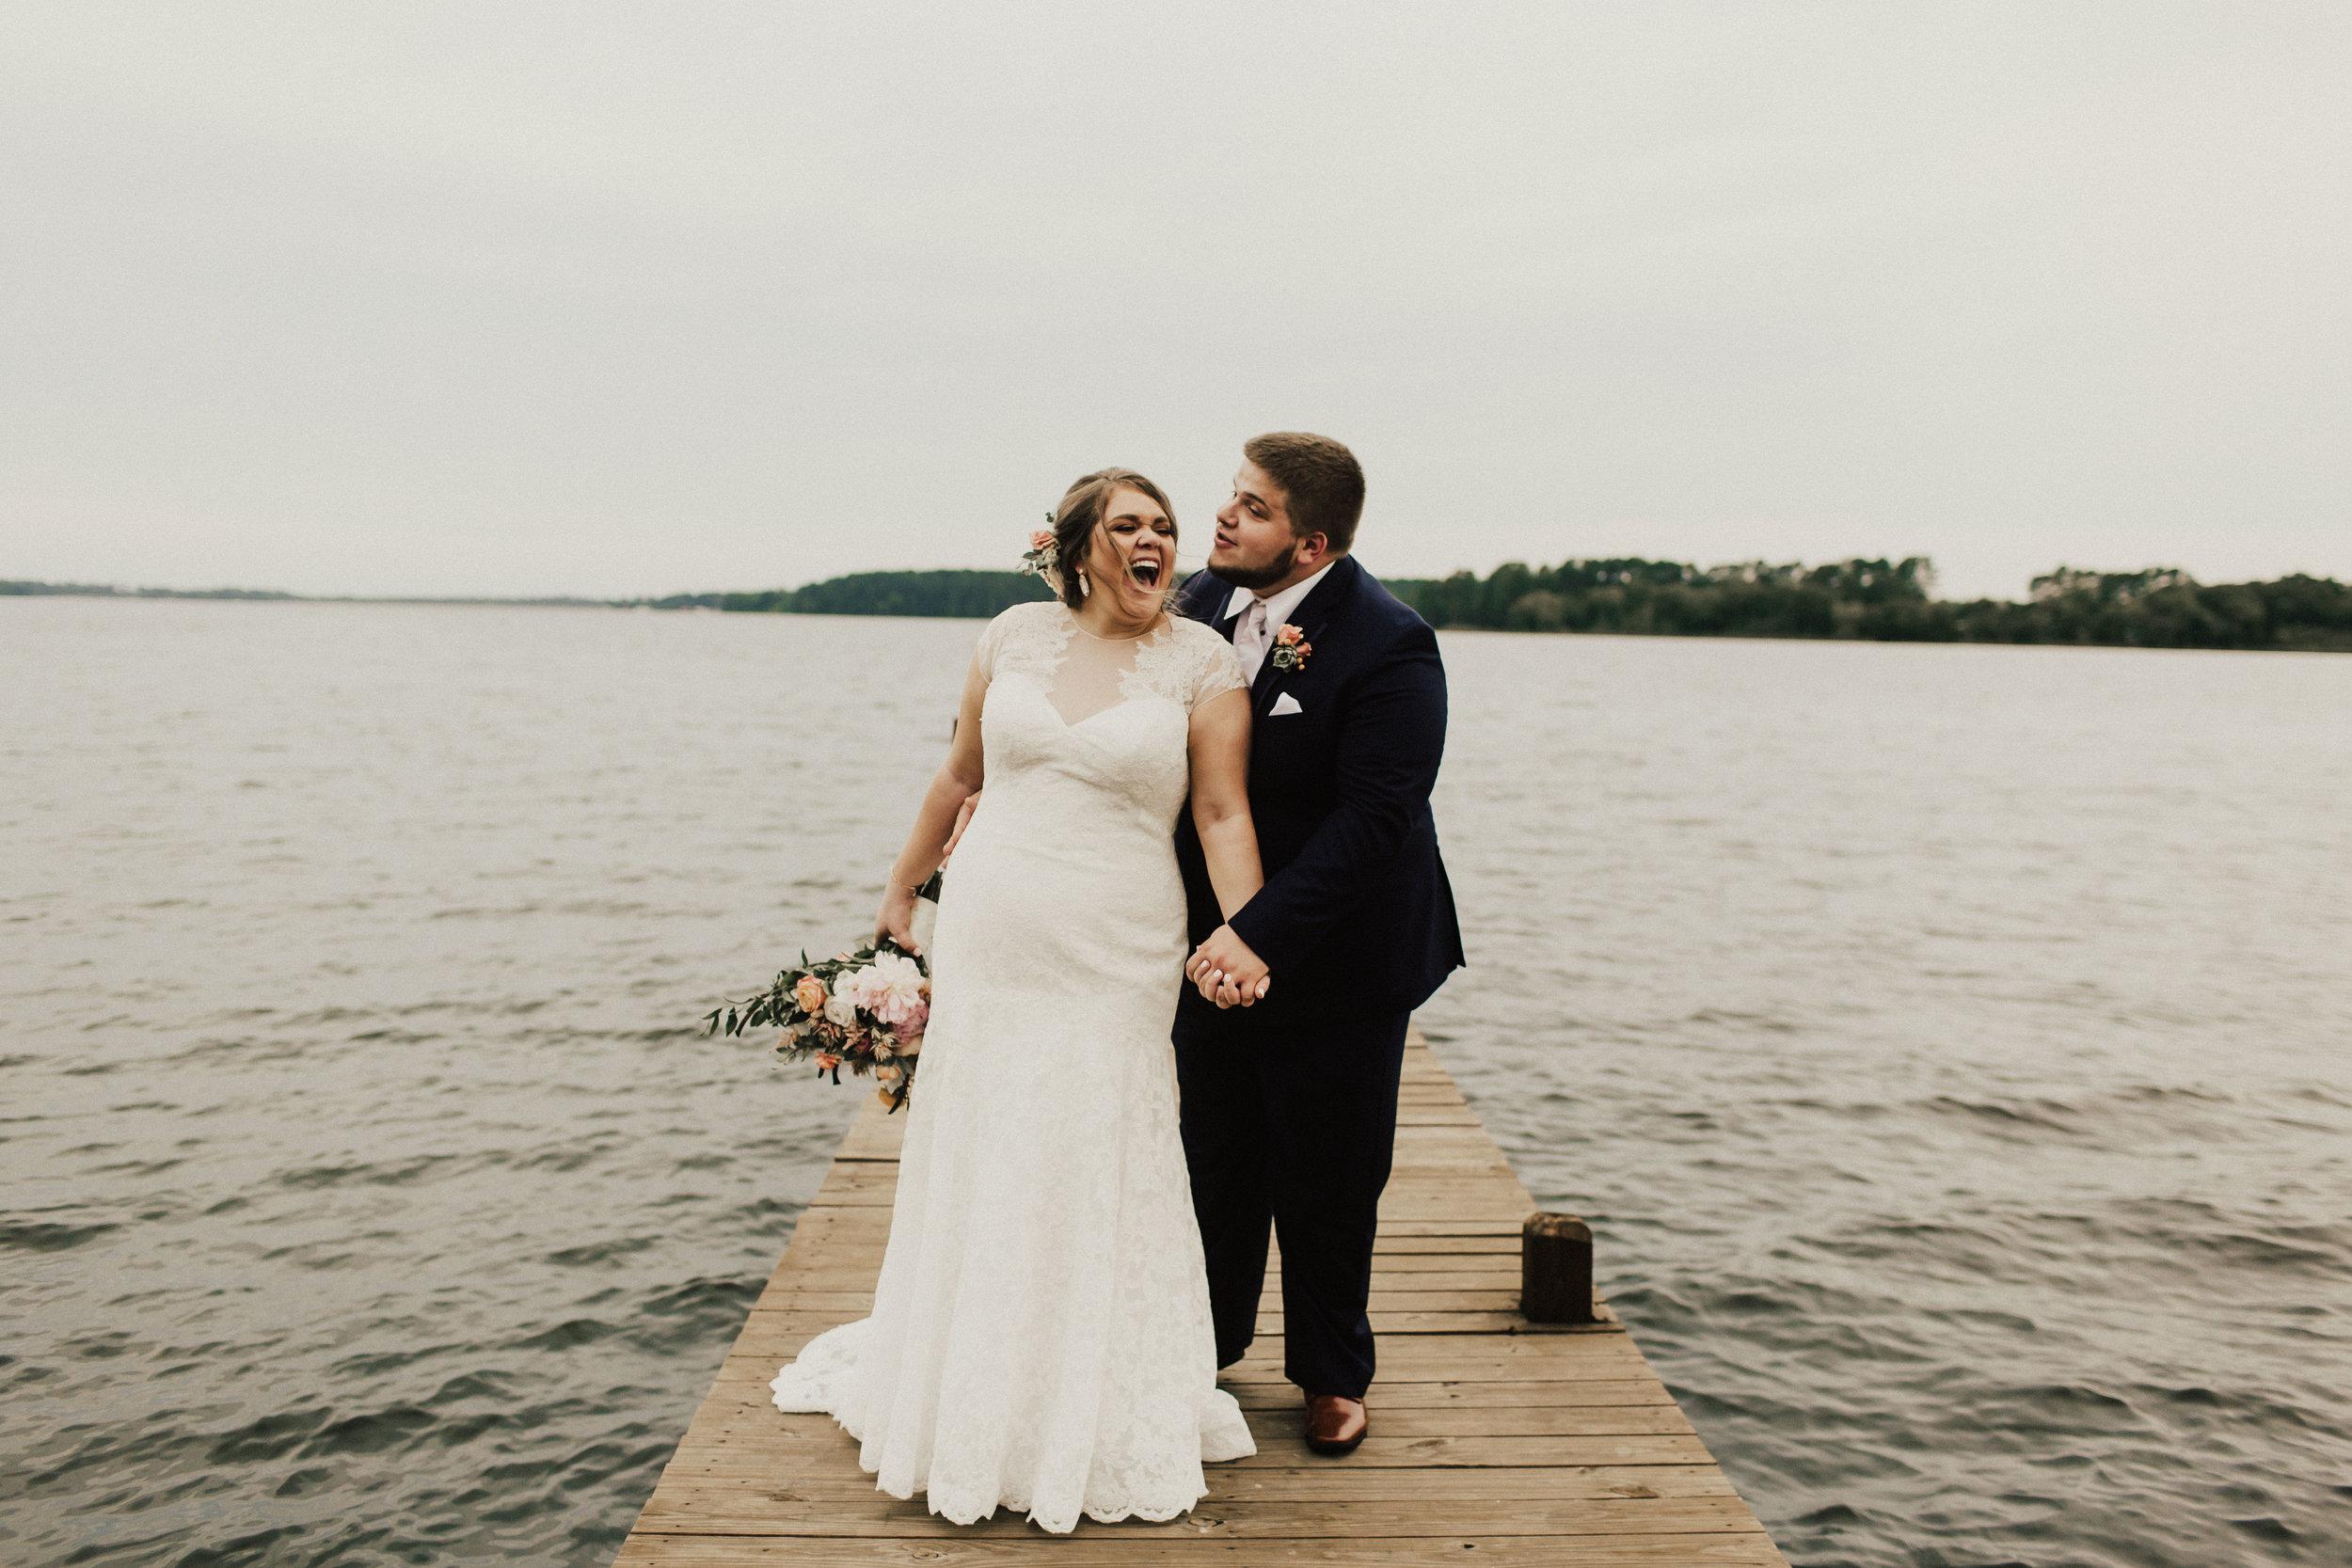 caitlin-jackson-wedding-photographer-lake-tyler-petroleum-club-texas--588.jpg